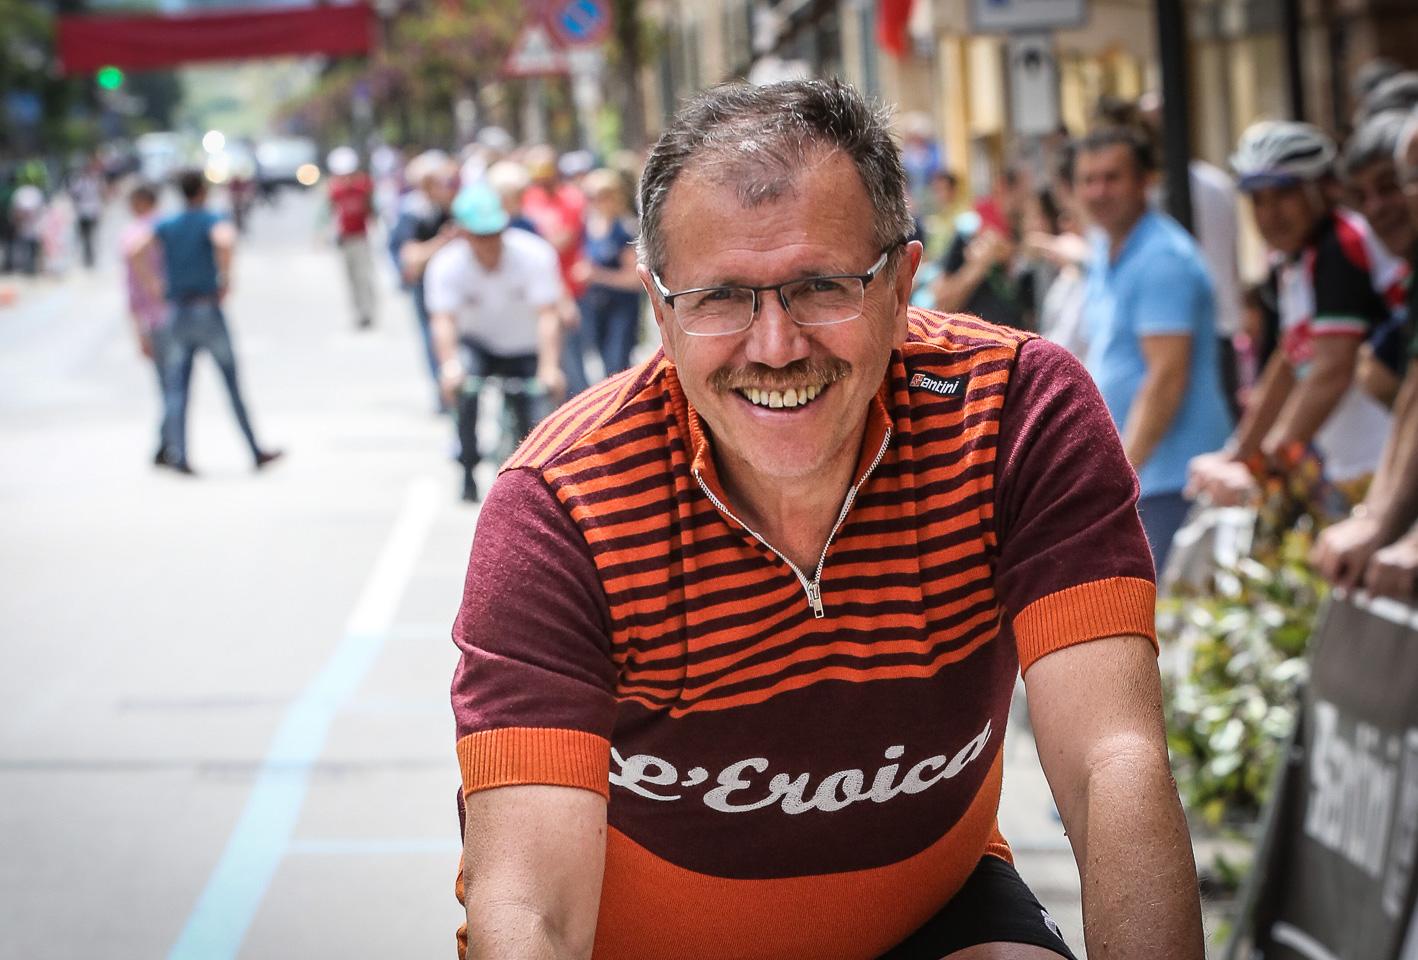 Giancarlo Brocci